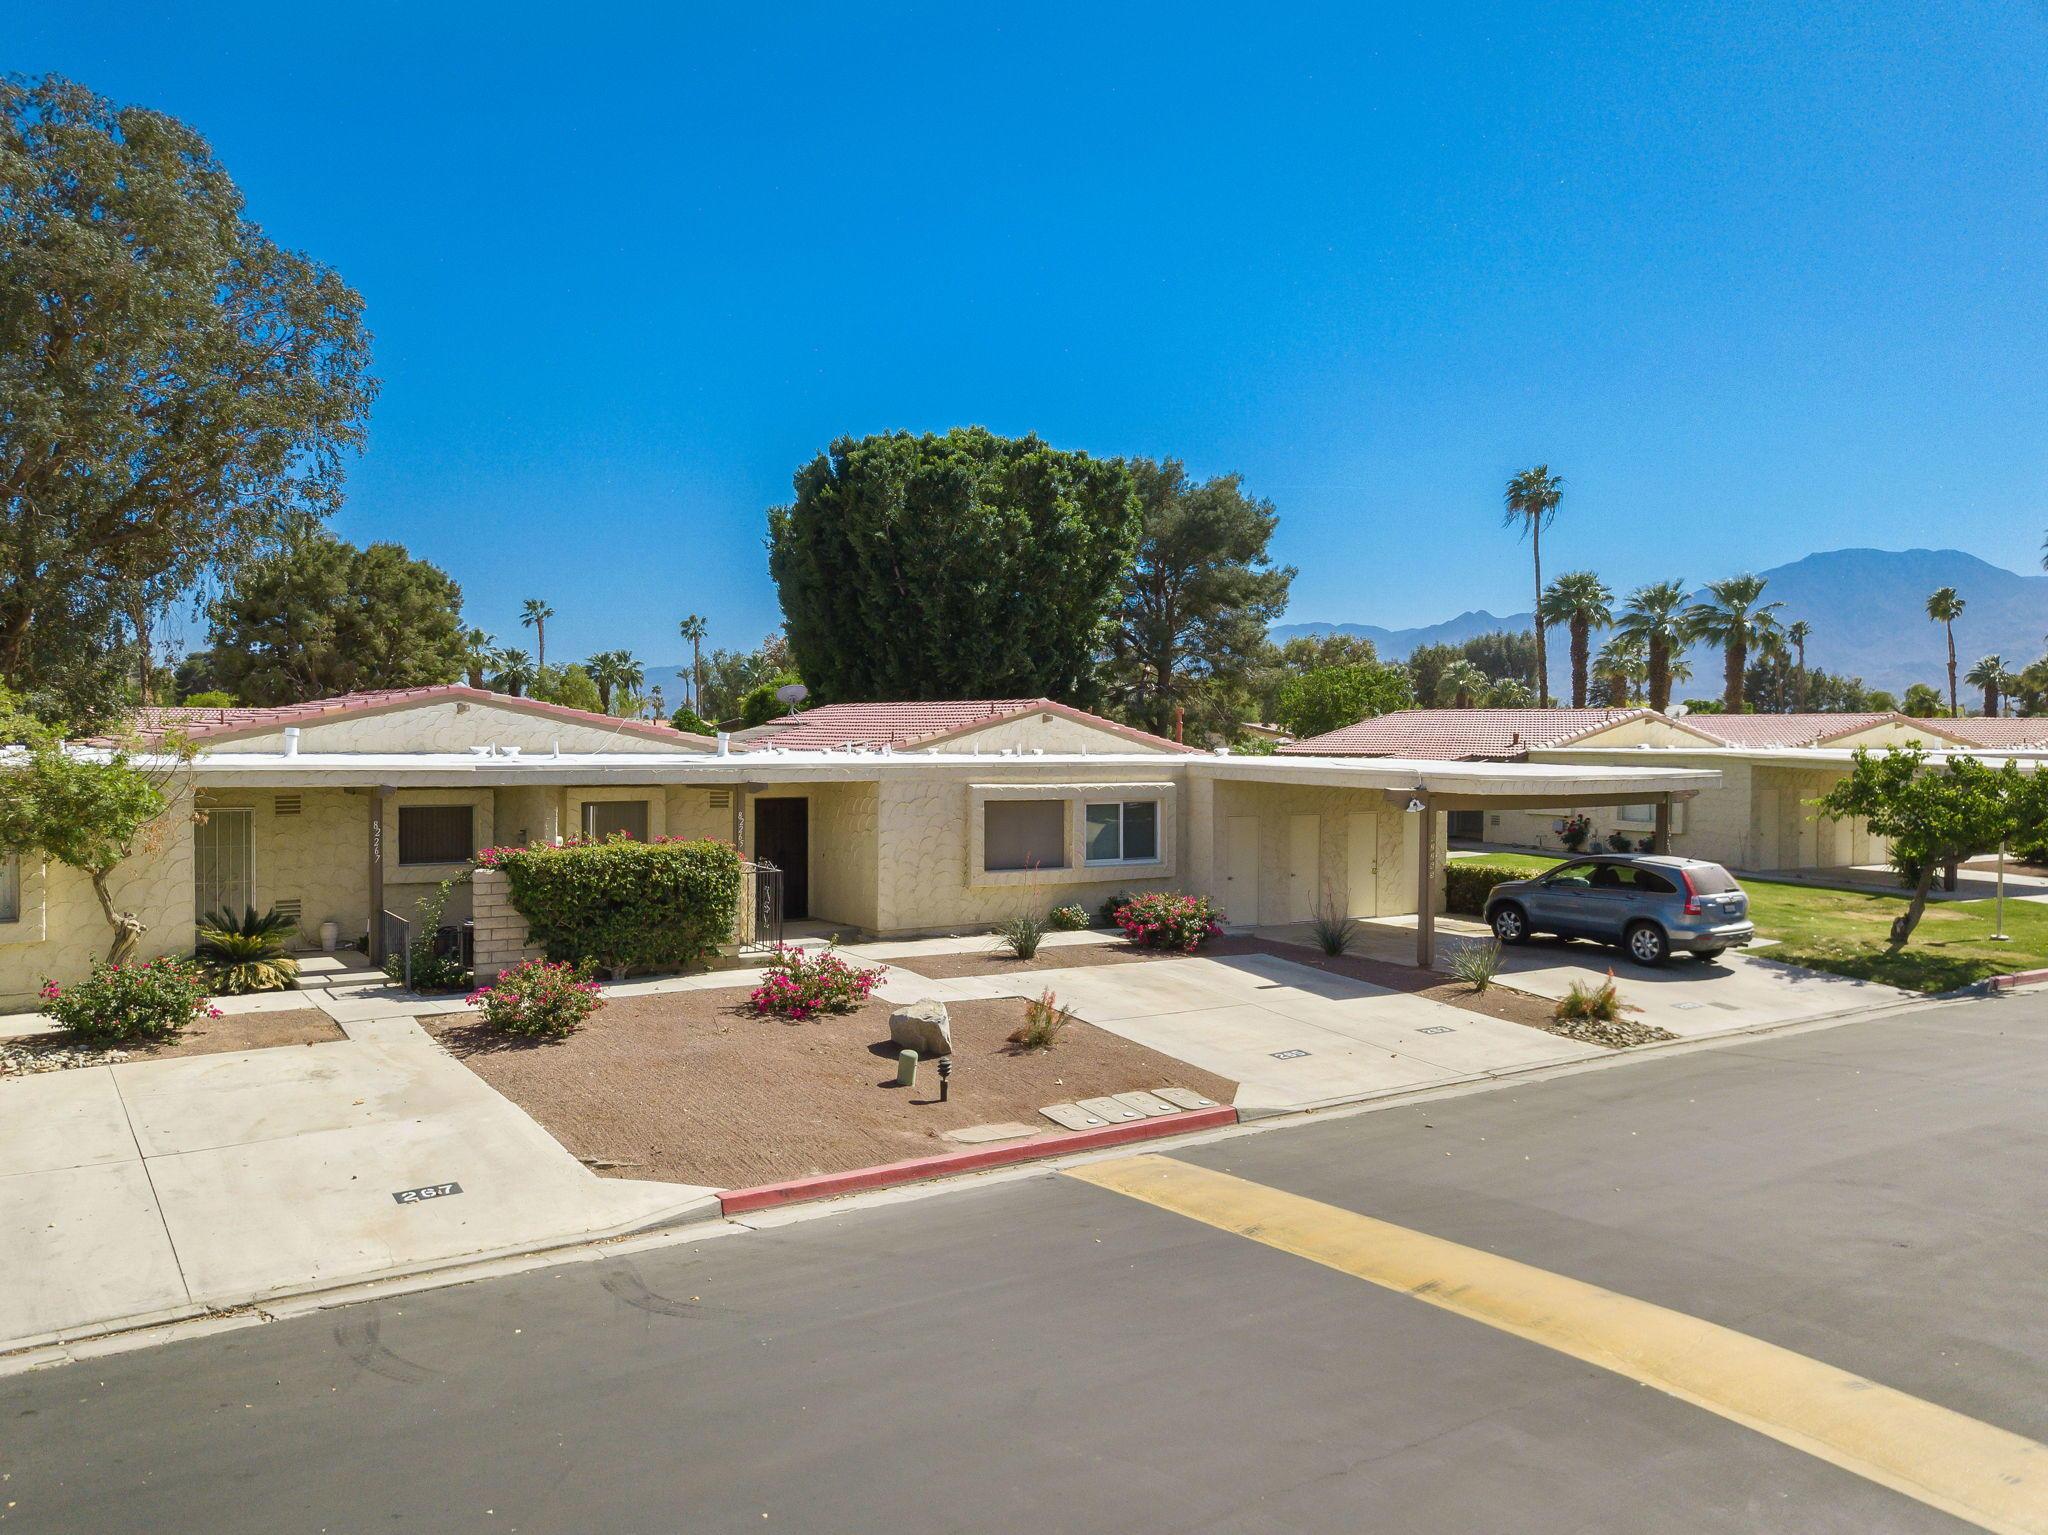 Photo of 82265 Odlum Drive, Indio, CA 92201